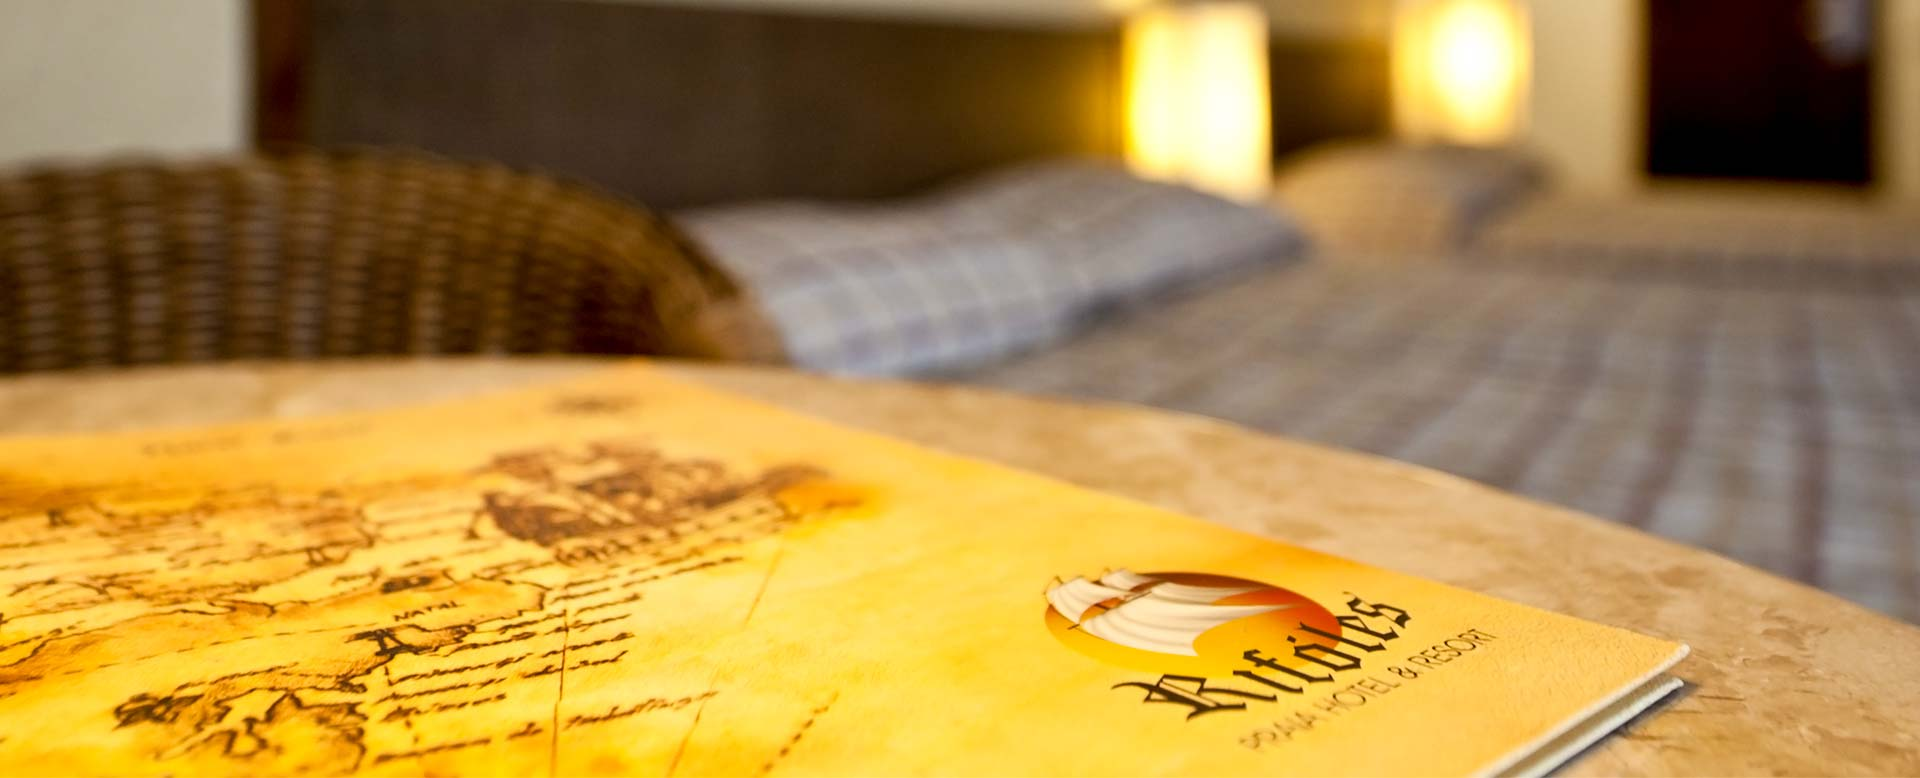 slider-page-rifoles-praia-hotel-e-resort-institucional